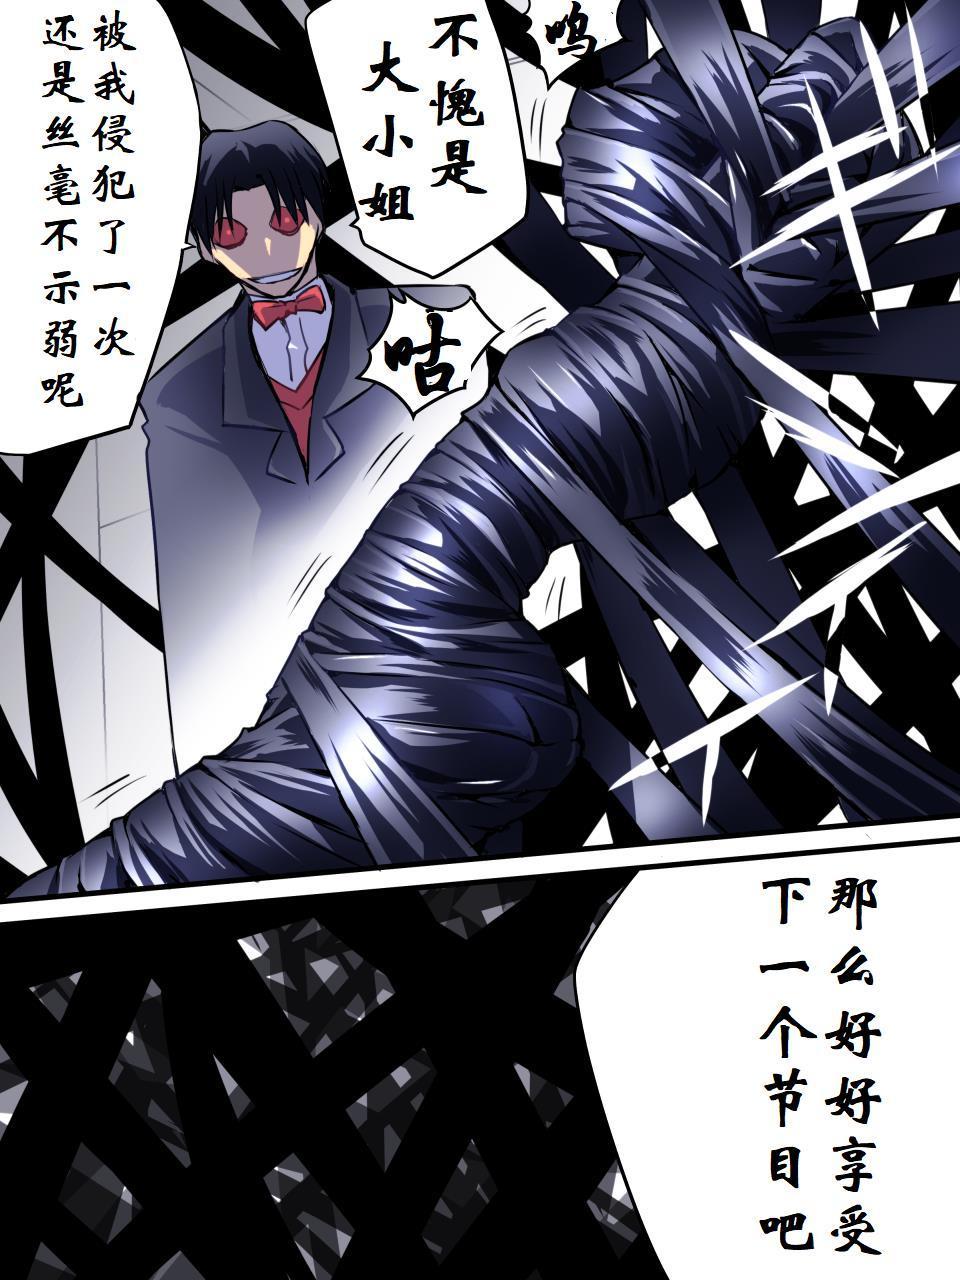 [Atelier Hachifukuan] Superheroine Yuukai Ryoujoku III - Superheroine in Distress [Chrome Rose Bell]   凌辱诱拐3 [Chinese] [有条色狼汉化] 25